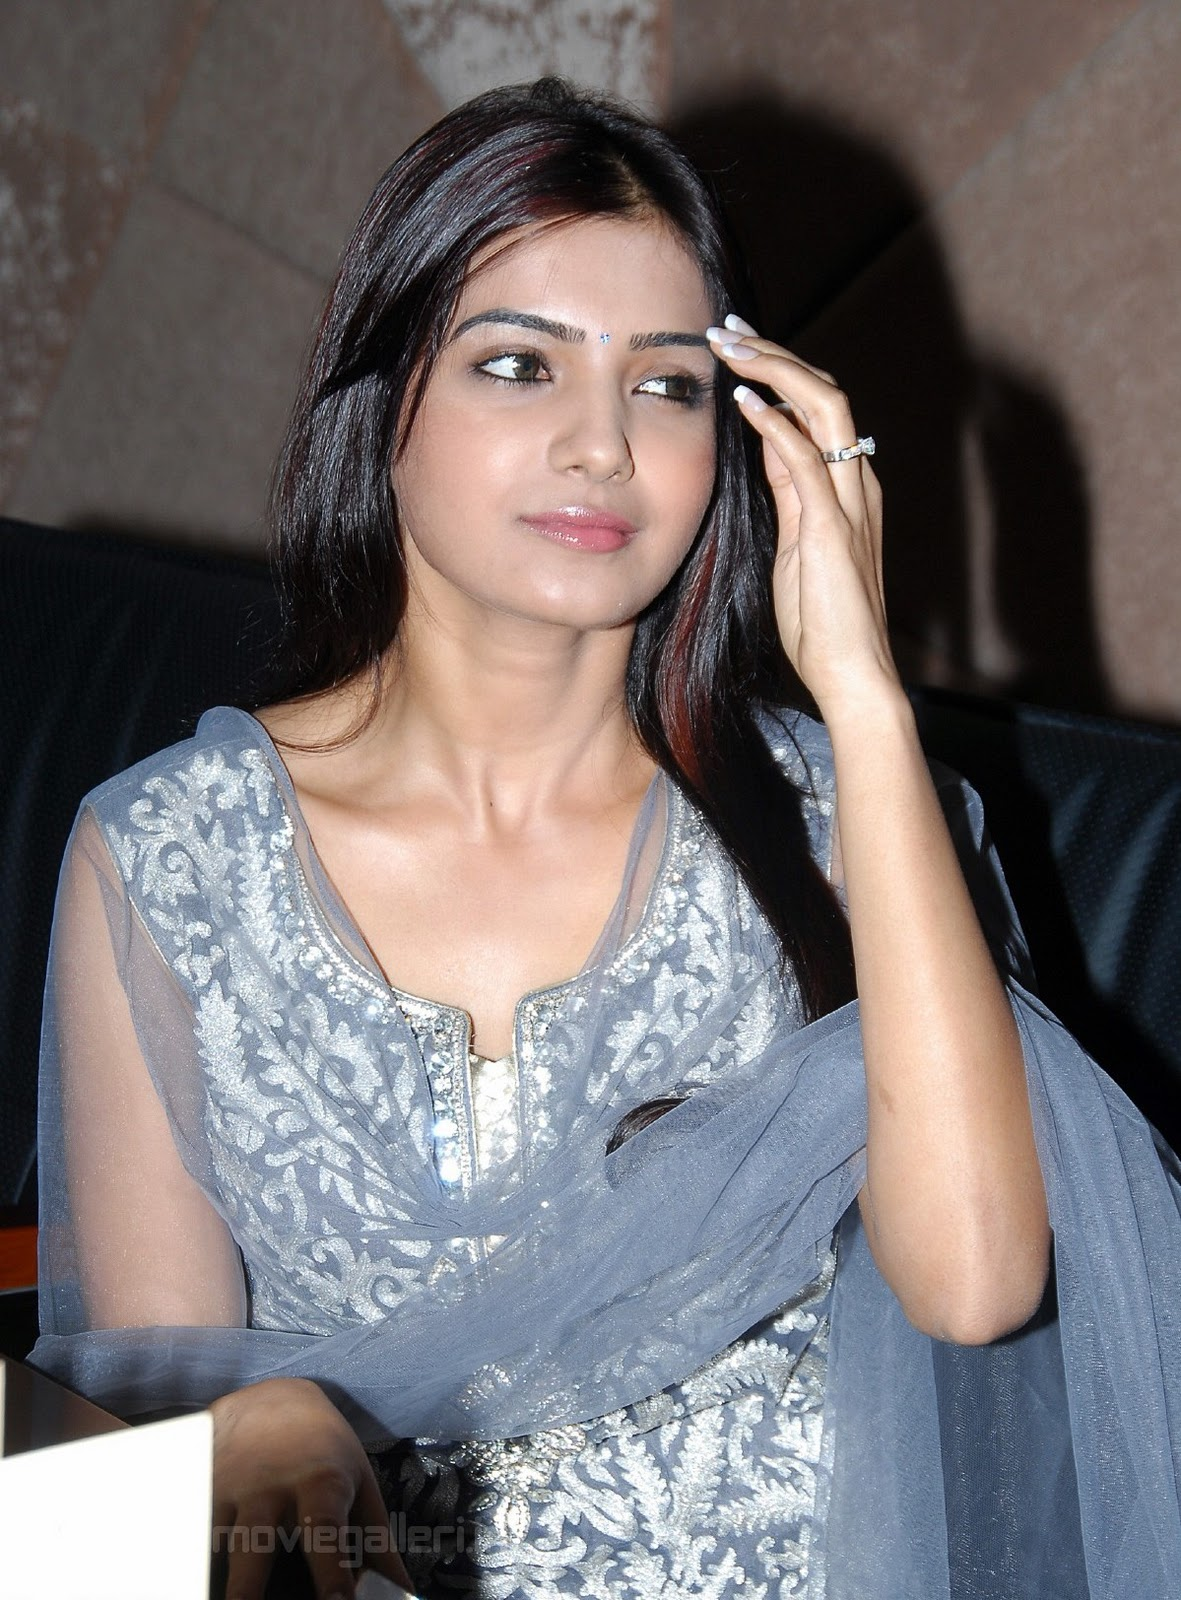 Indian Actress Samantha wallpapers (131 Wallpapers